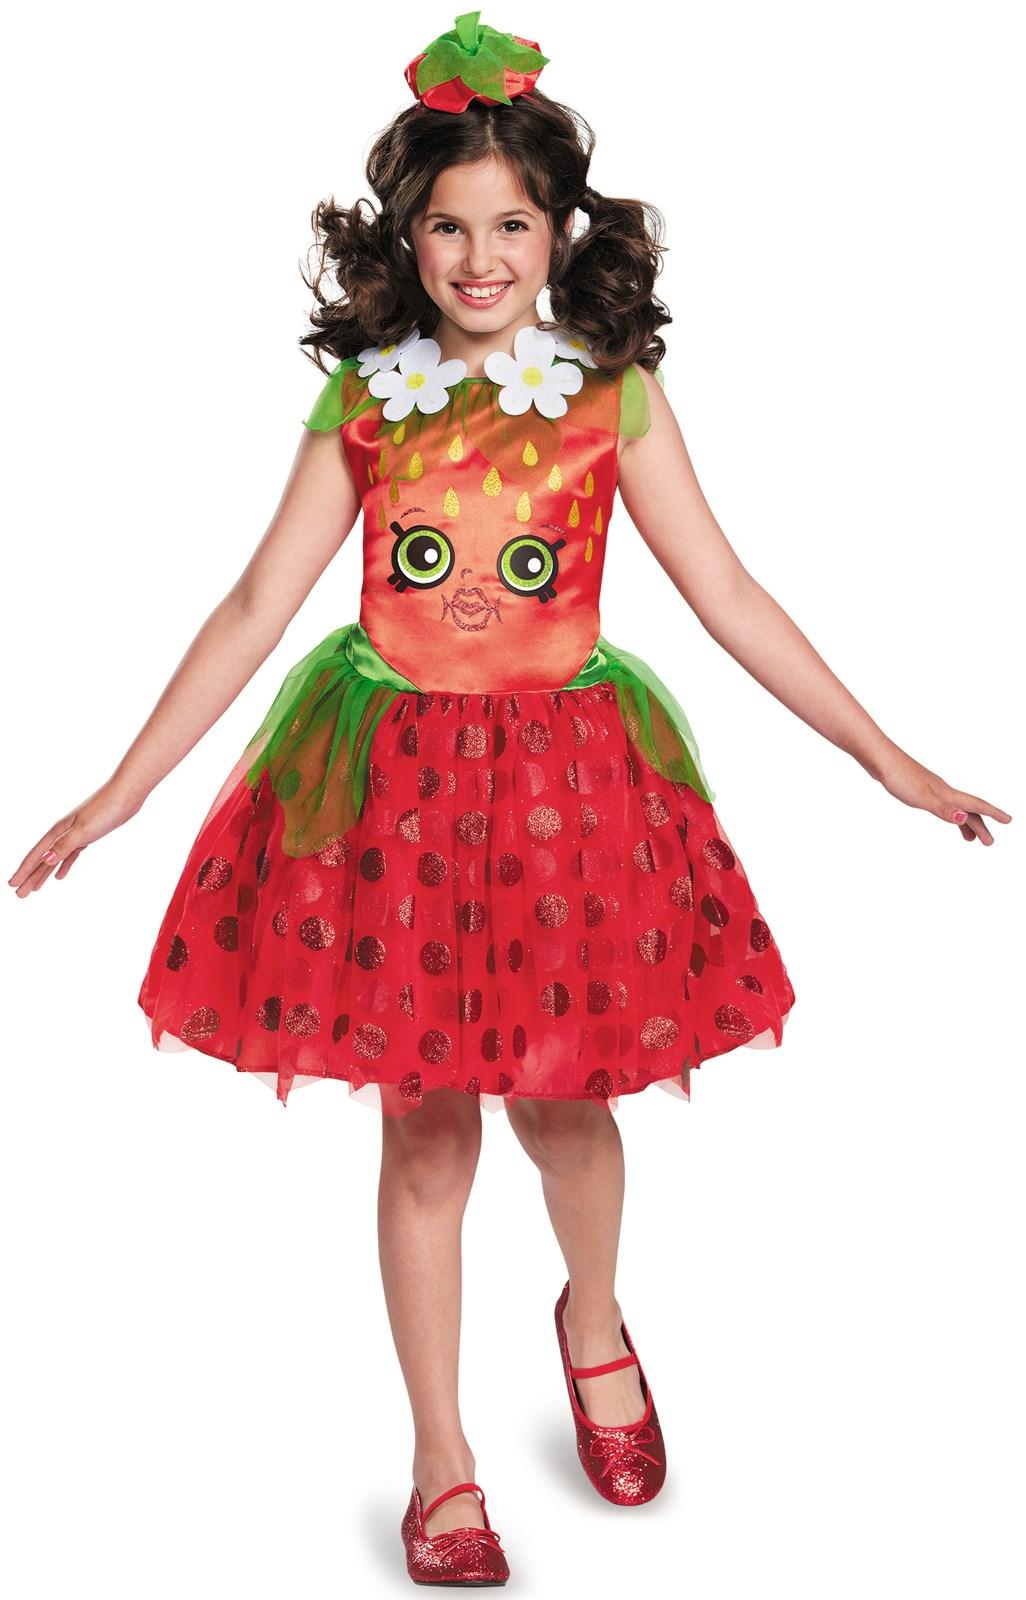 shopkins strawberry kiss girls costume. Black Bedroom Furniture Sets. Home Design Ideas